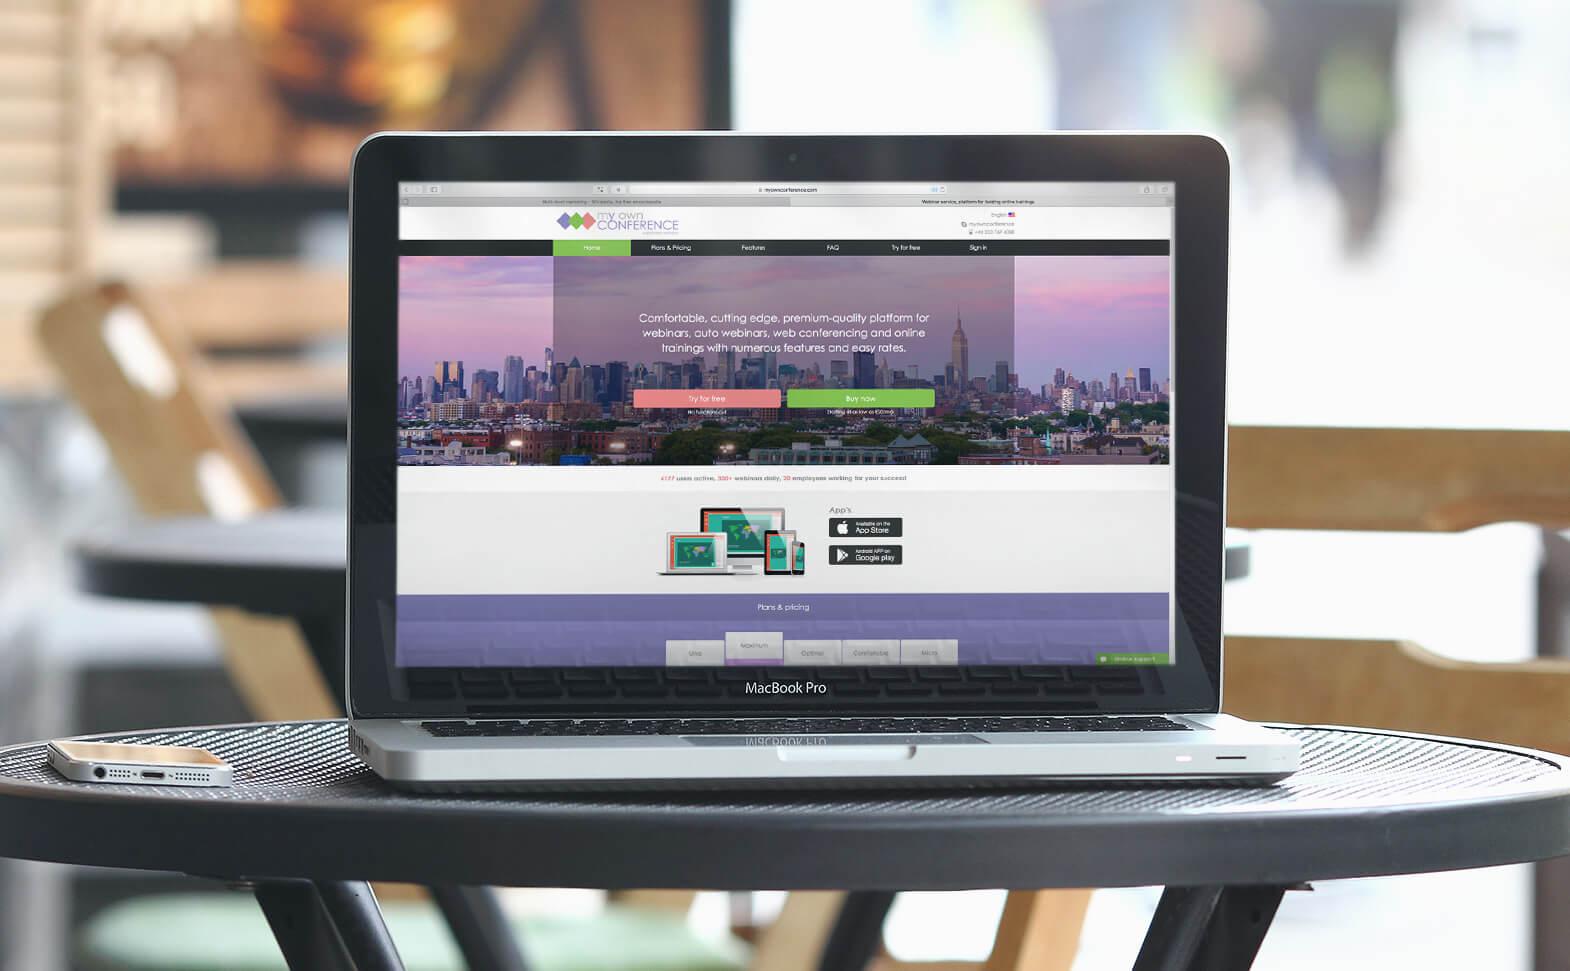 webinar on your website